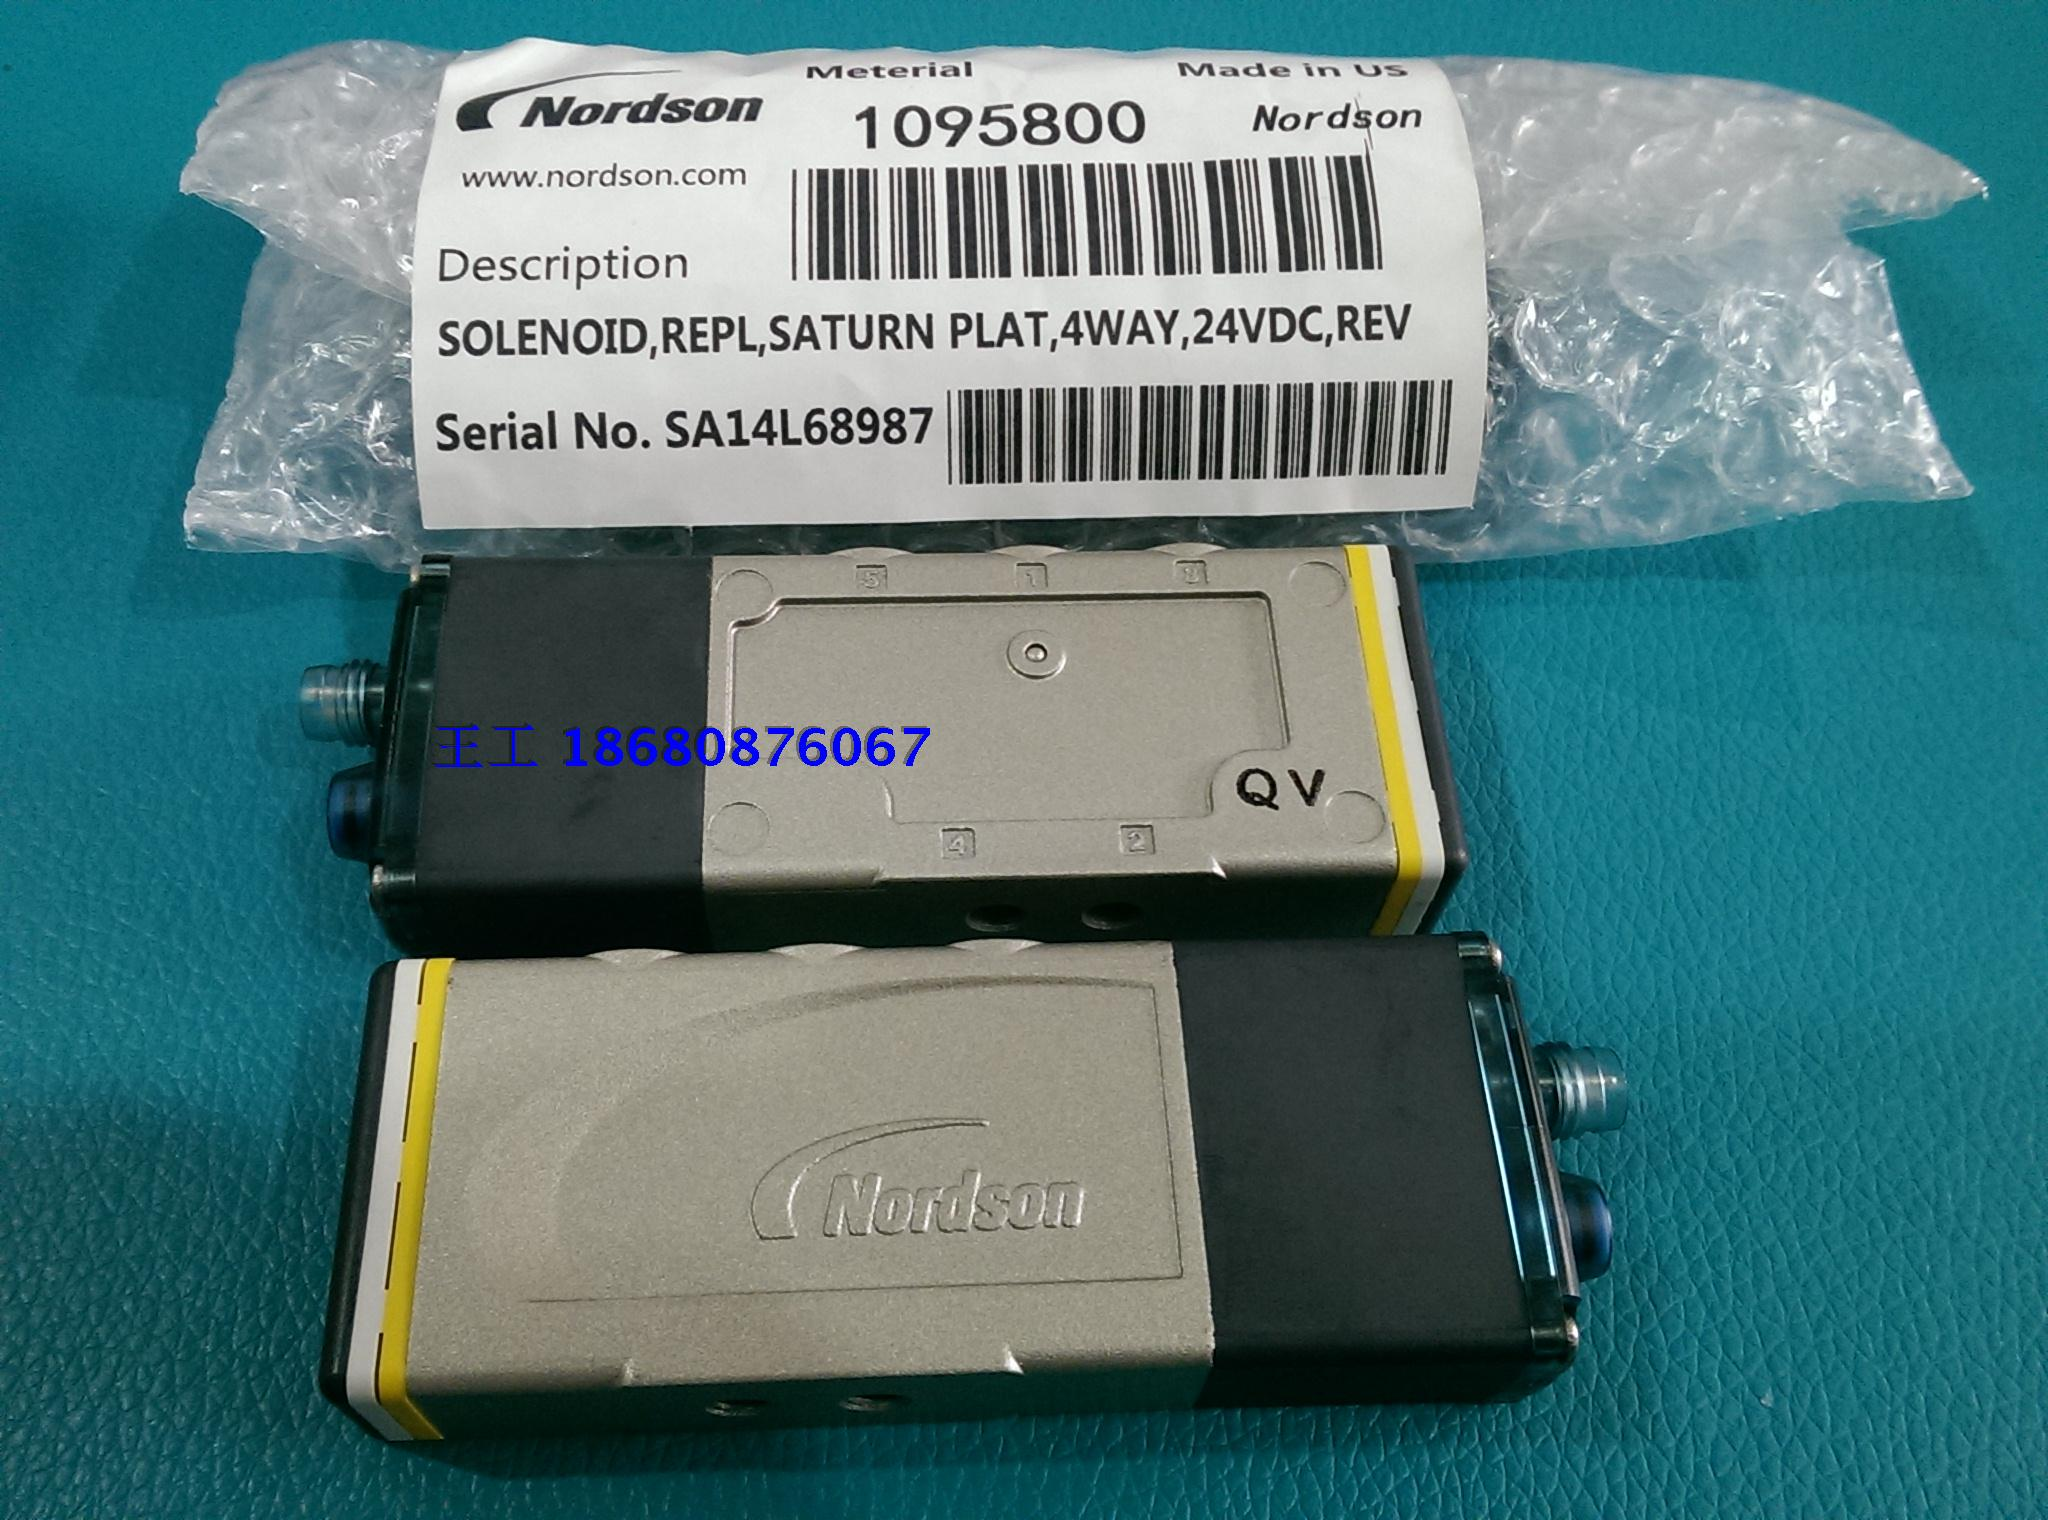 Solenoide valvola Solenoide, repl, saturn PLAT 1095800